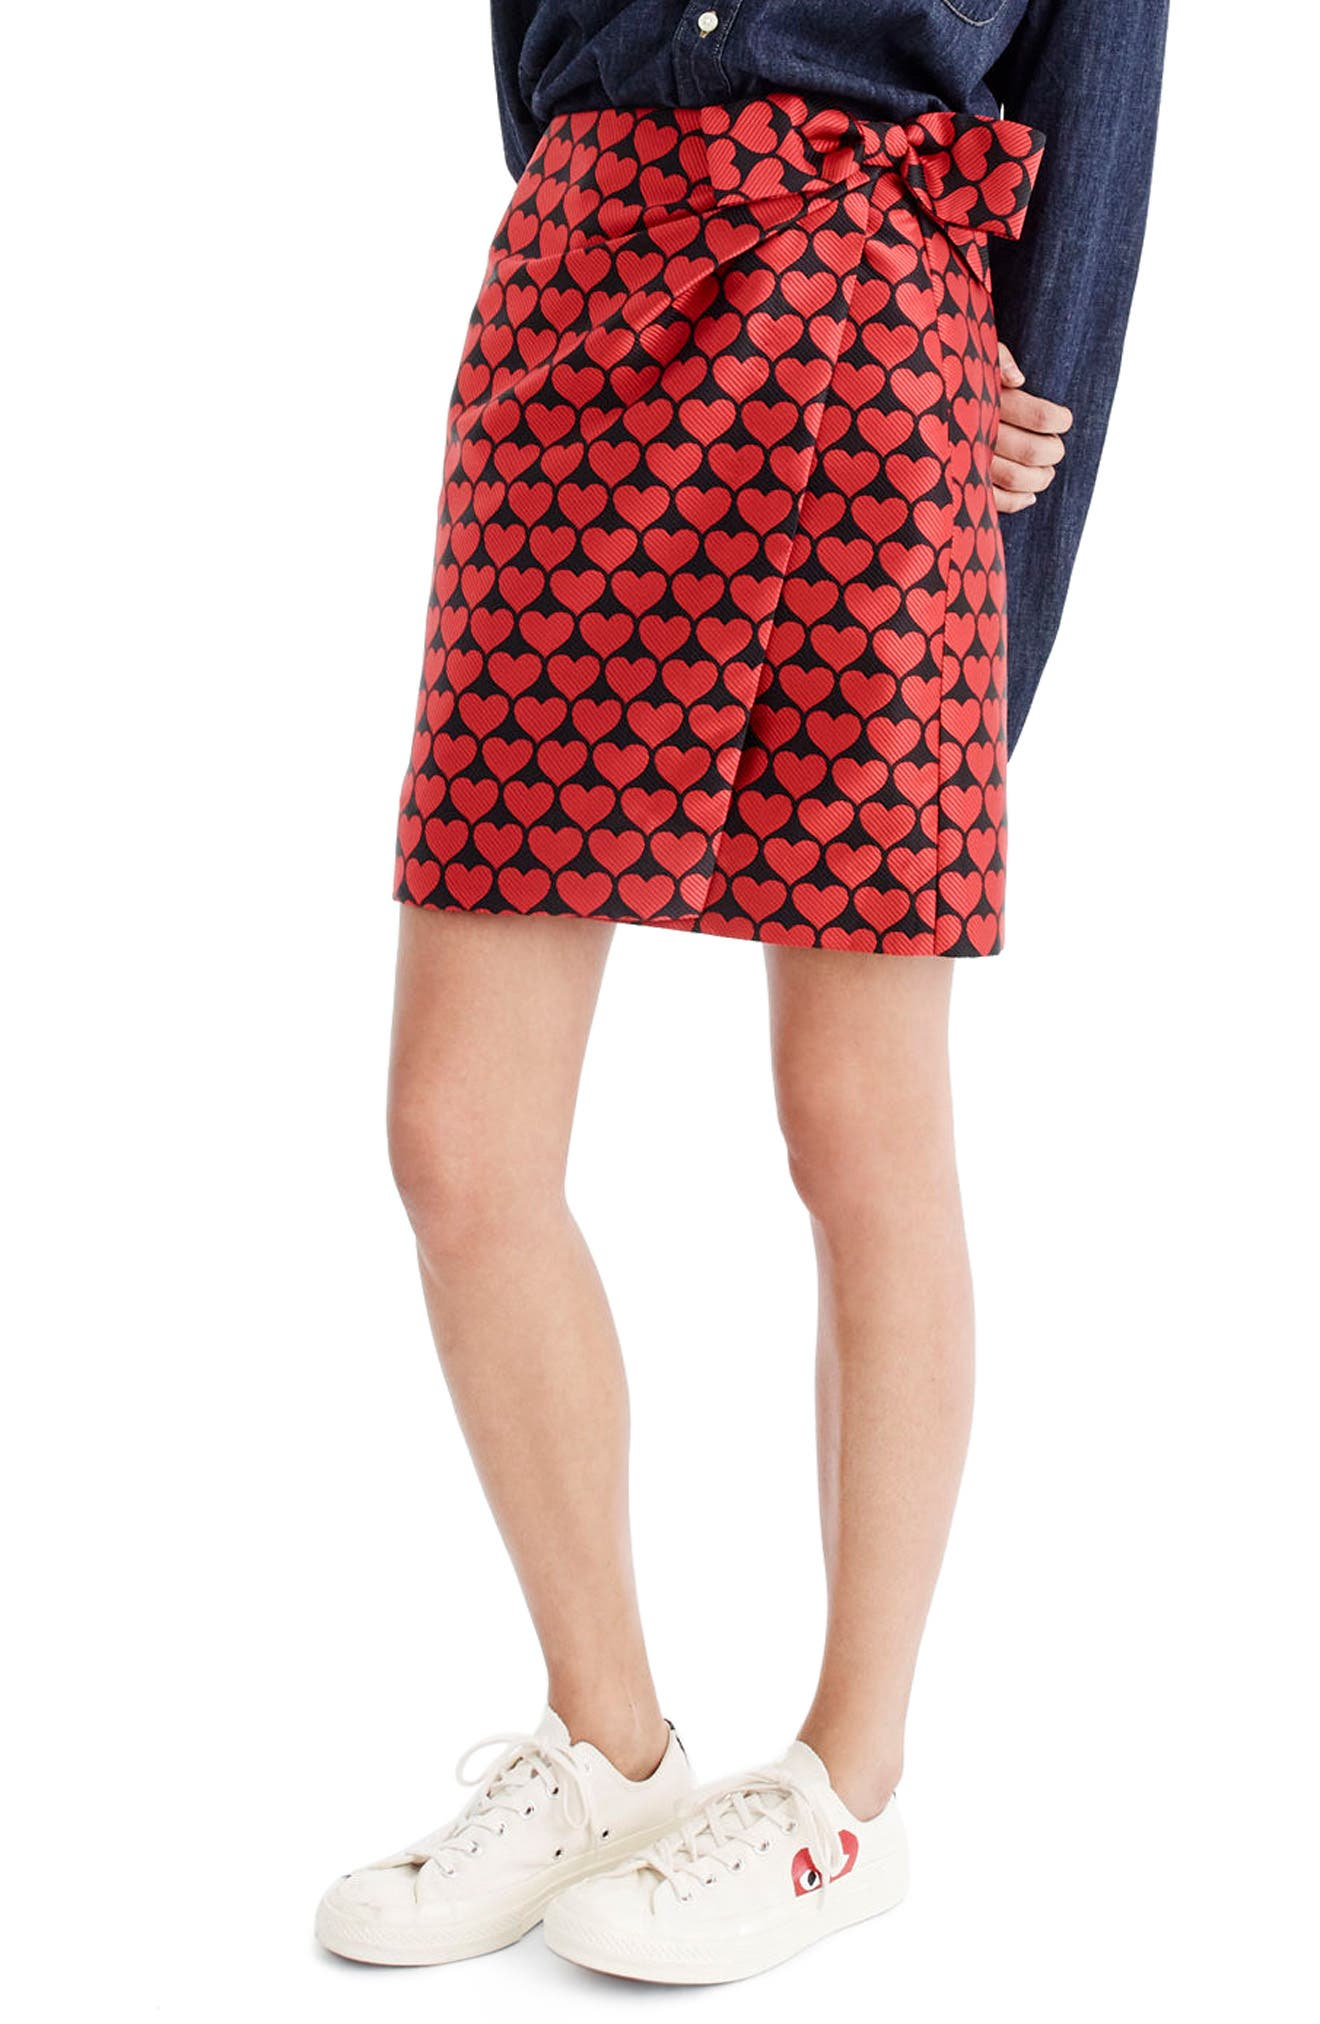 Castlebar Snuggle Heart Skirt,                         Main,                         color, 600